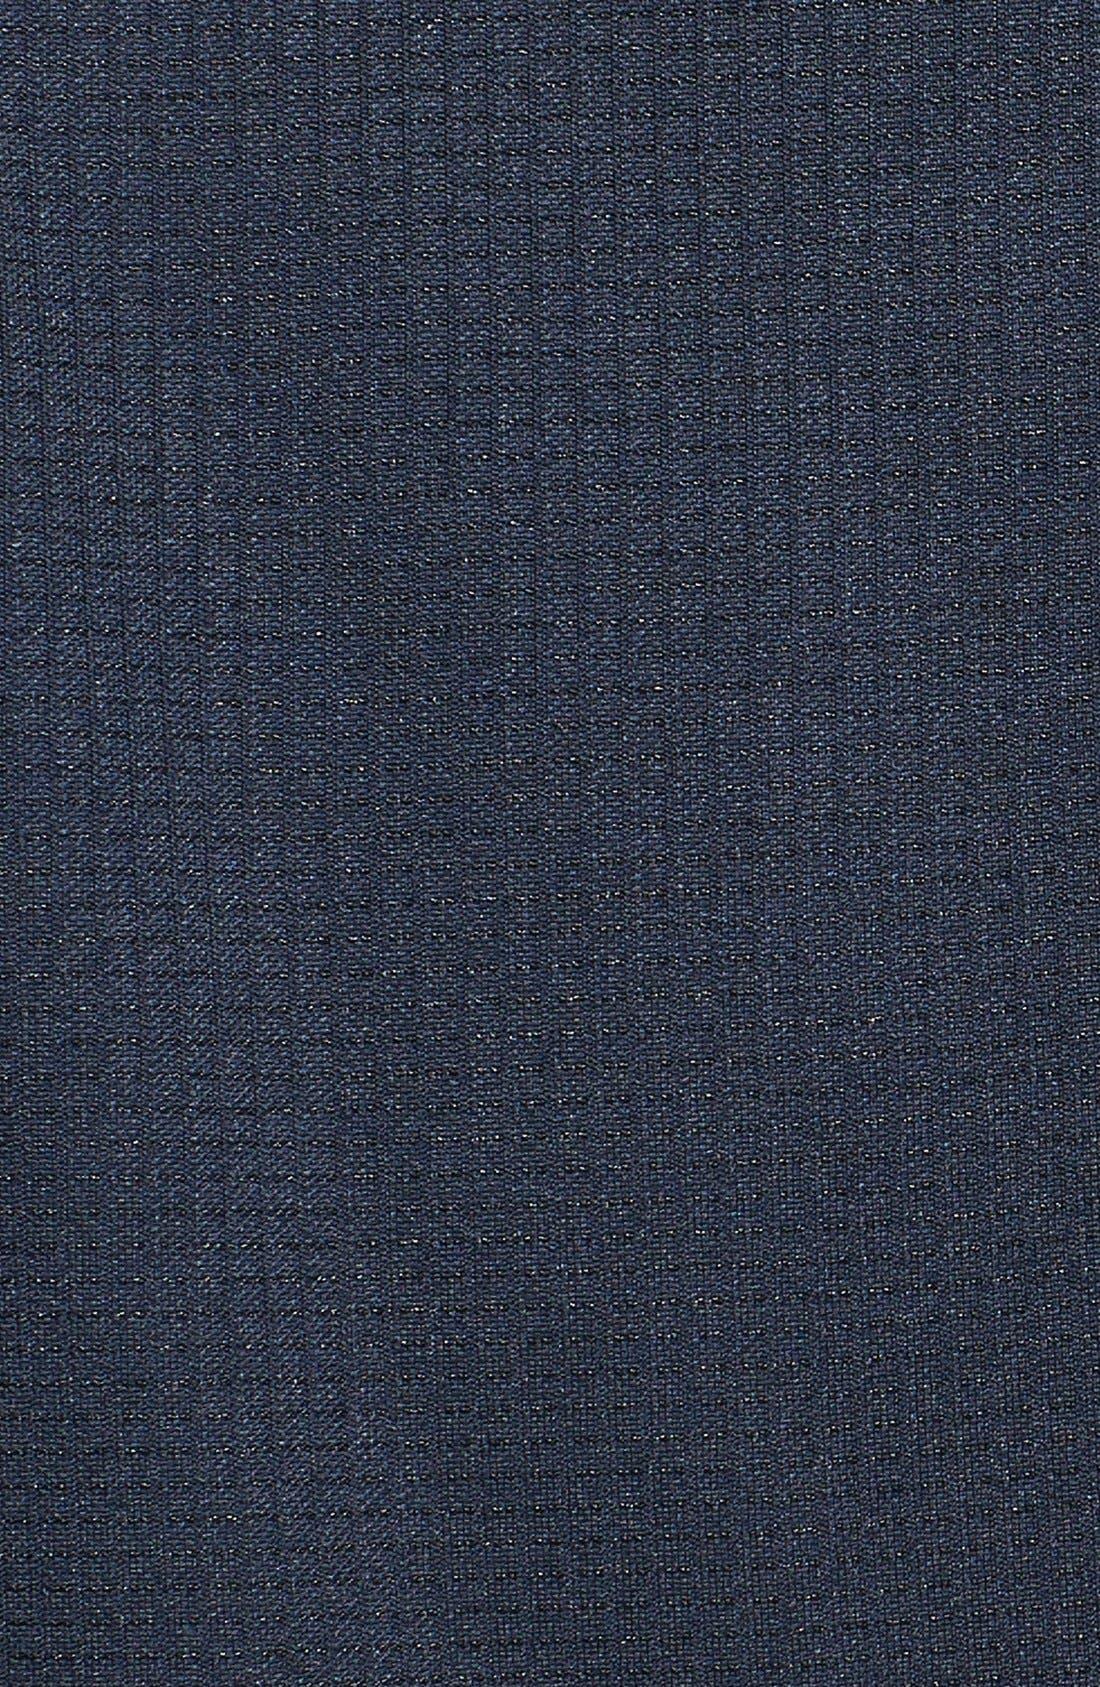 Los Angeles Rams - Genre DryTec Moisture Wicking Polo,                             Alternate thumbnail 3, color,                             Navy Blue